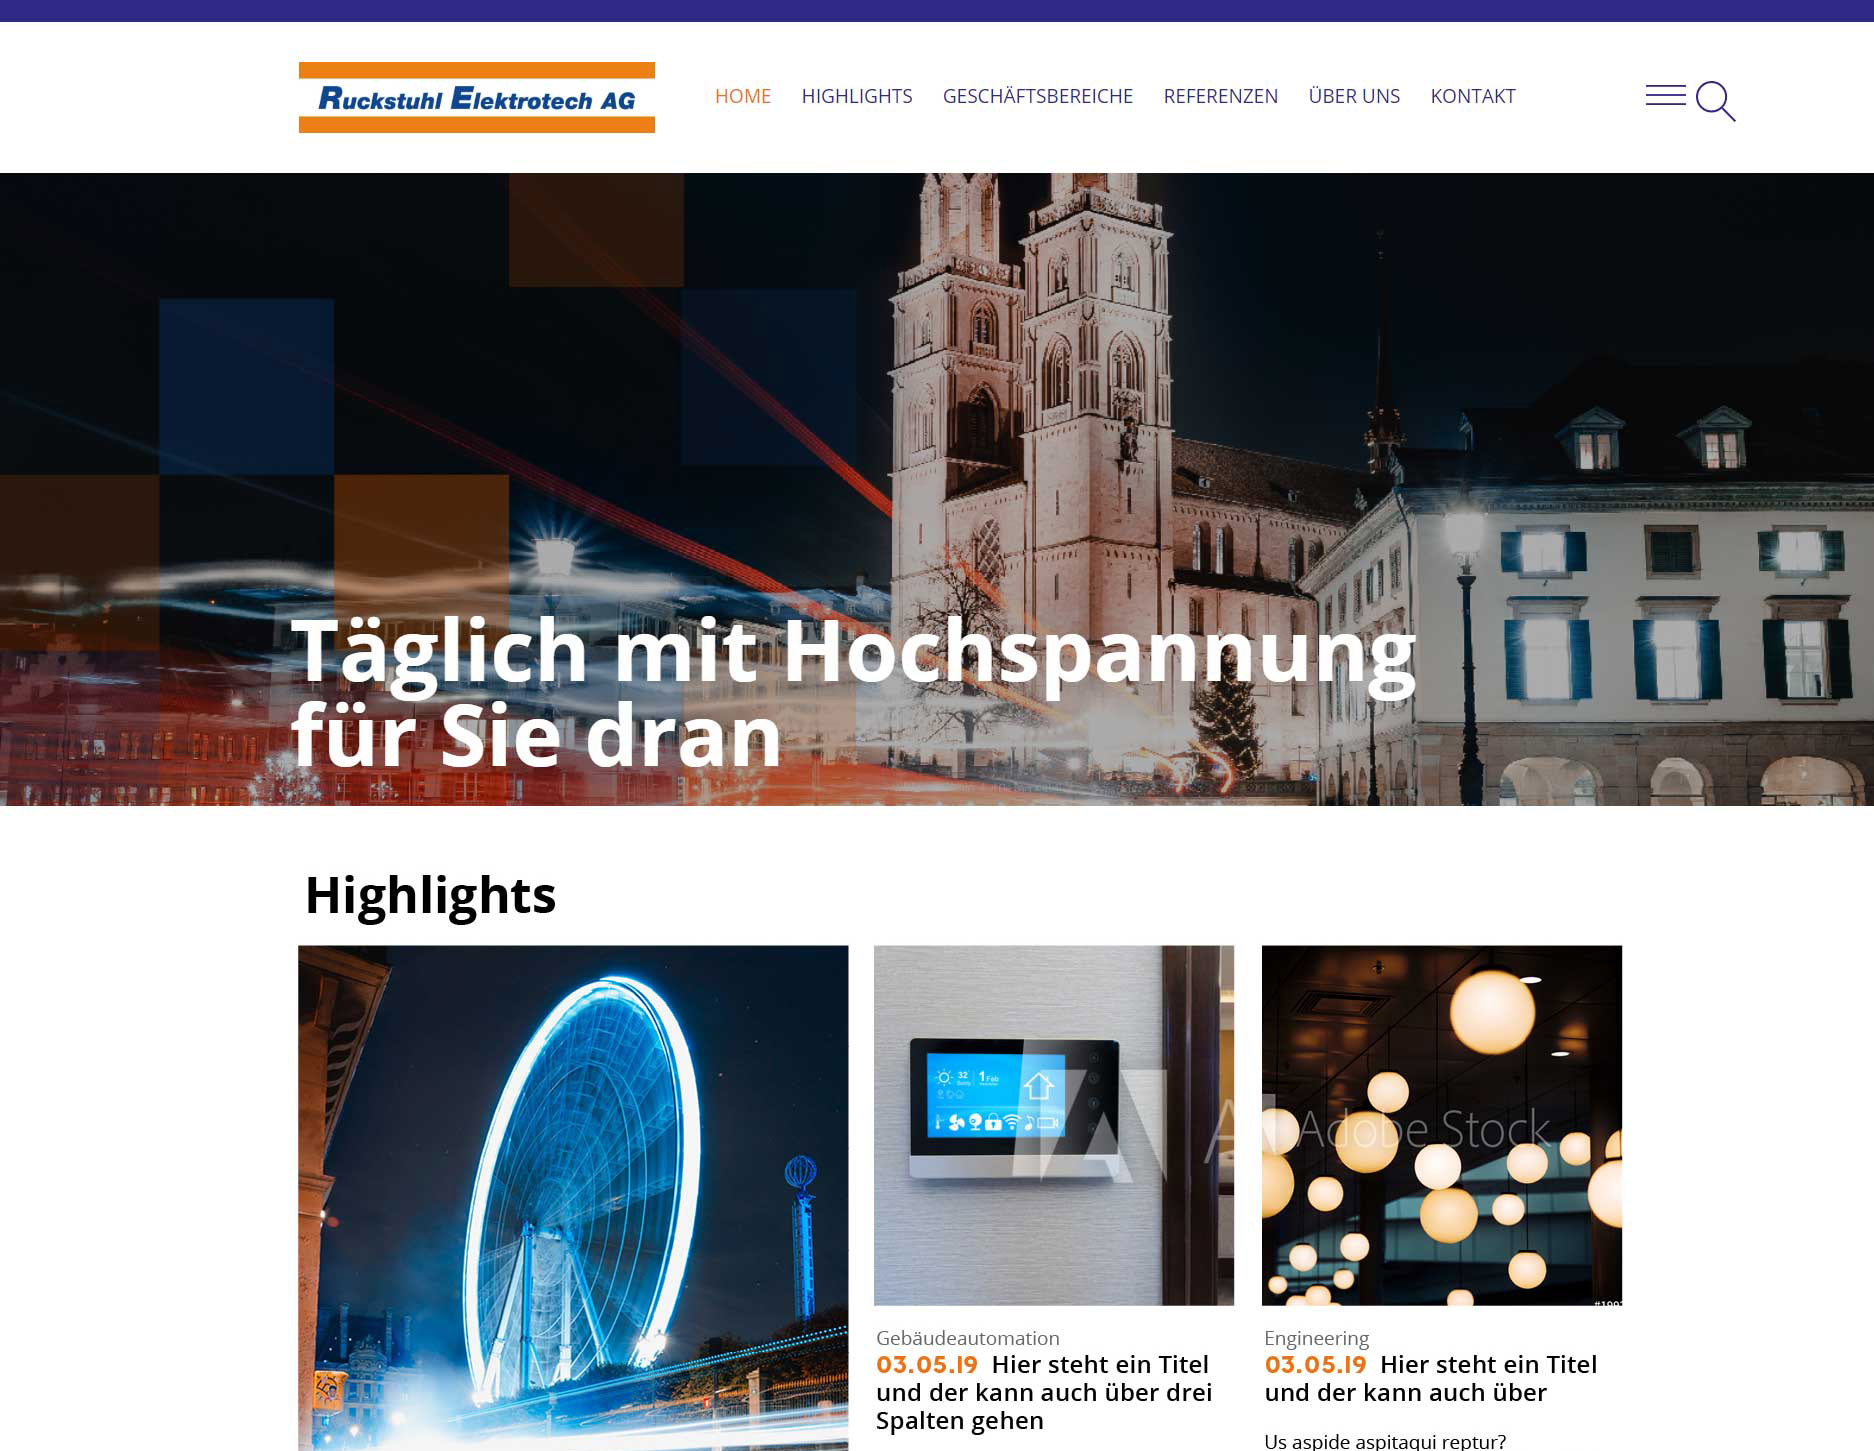 Website Ruckstuhl Elektrotech AG